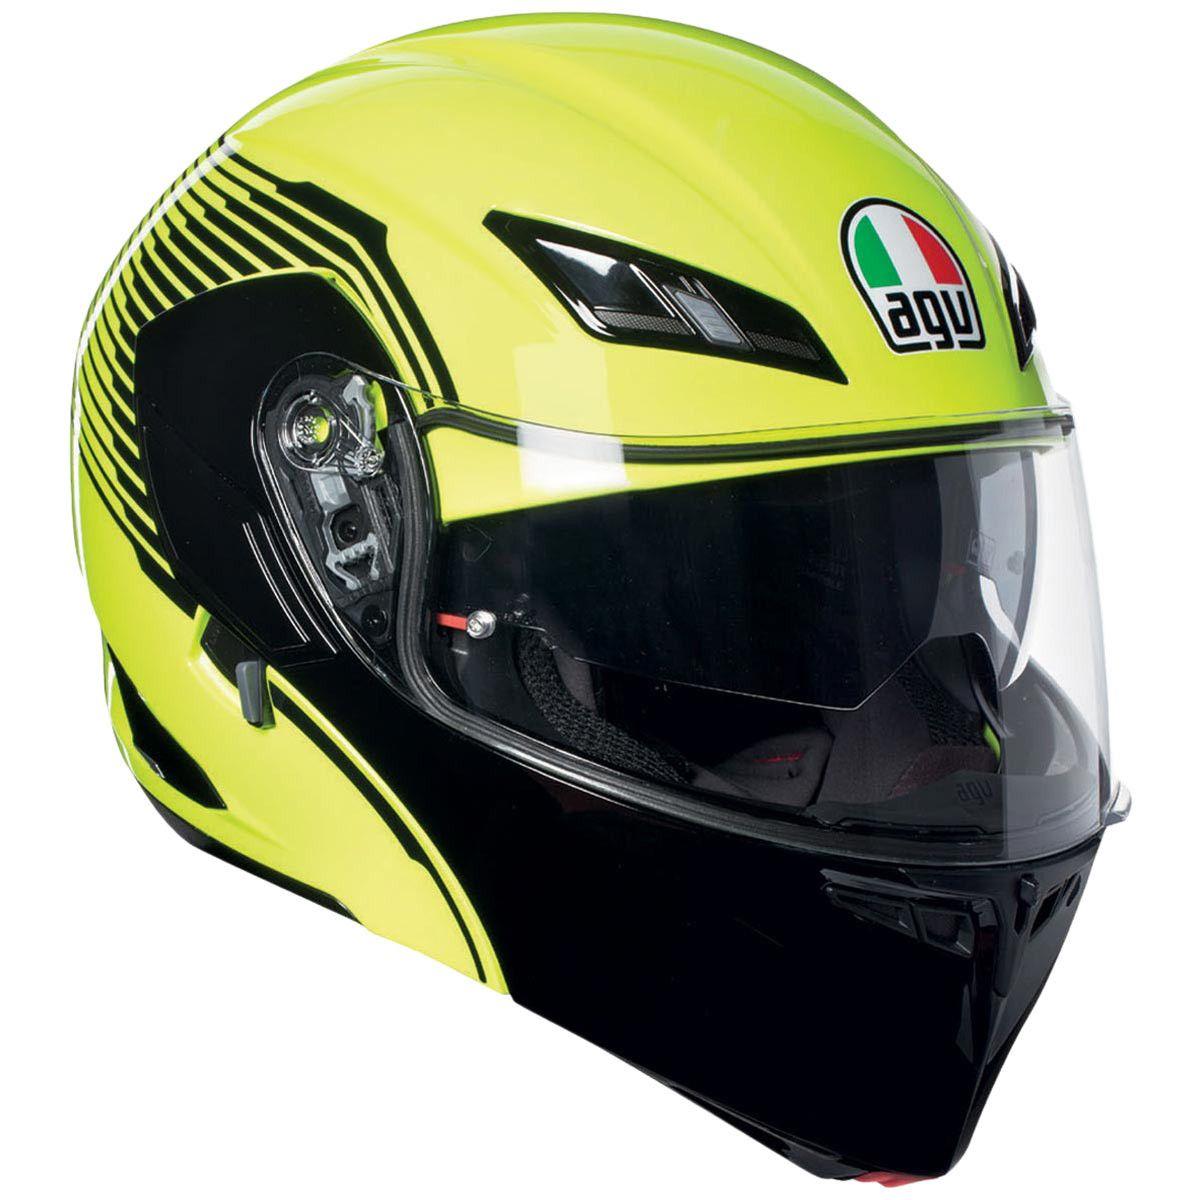 AGV CompactST Vermont Helmet in Yellow/Black